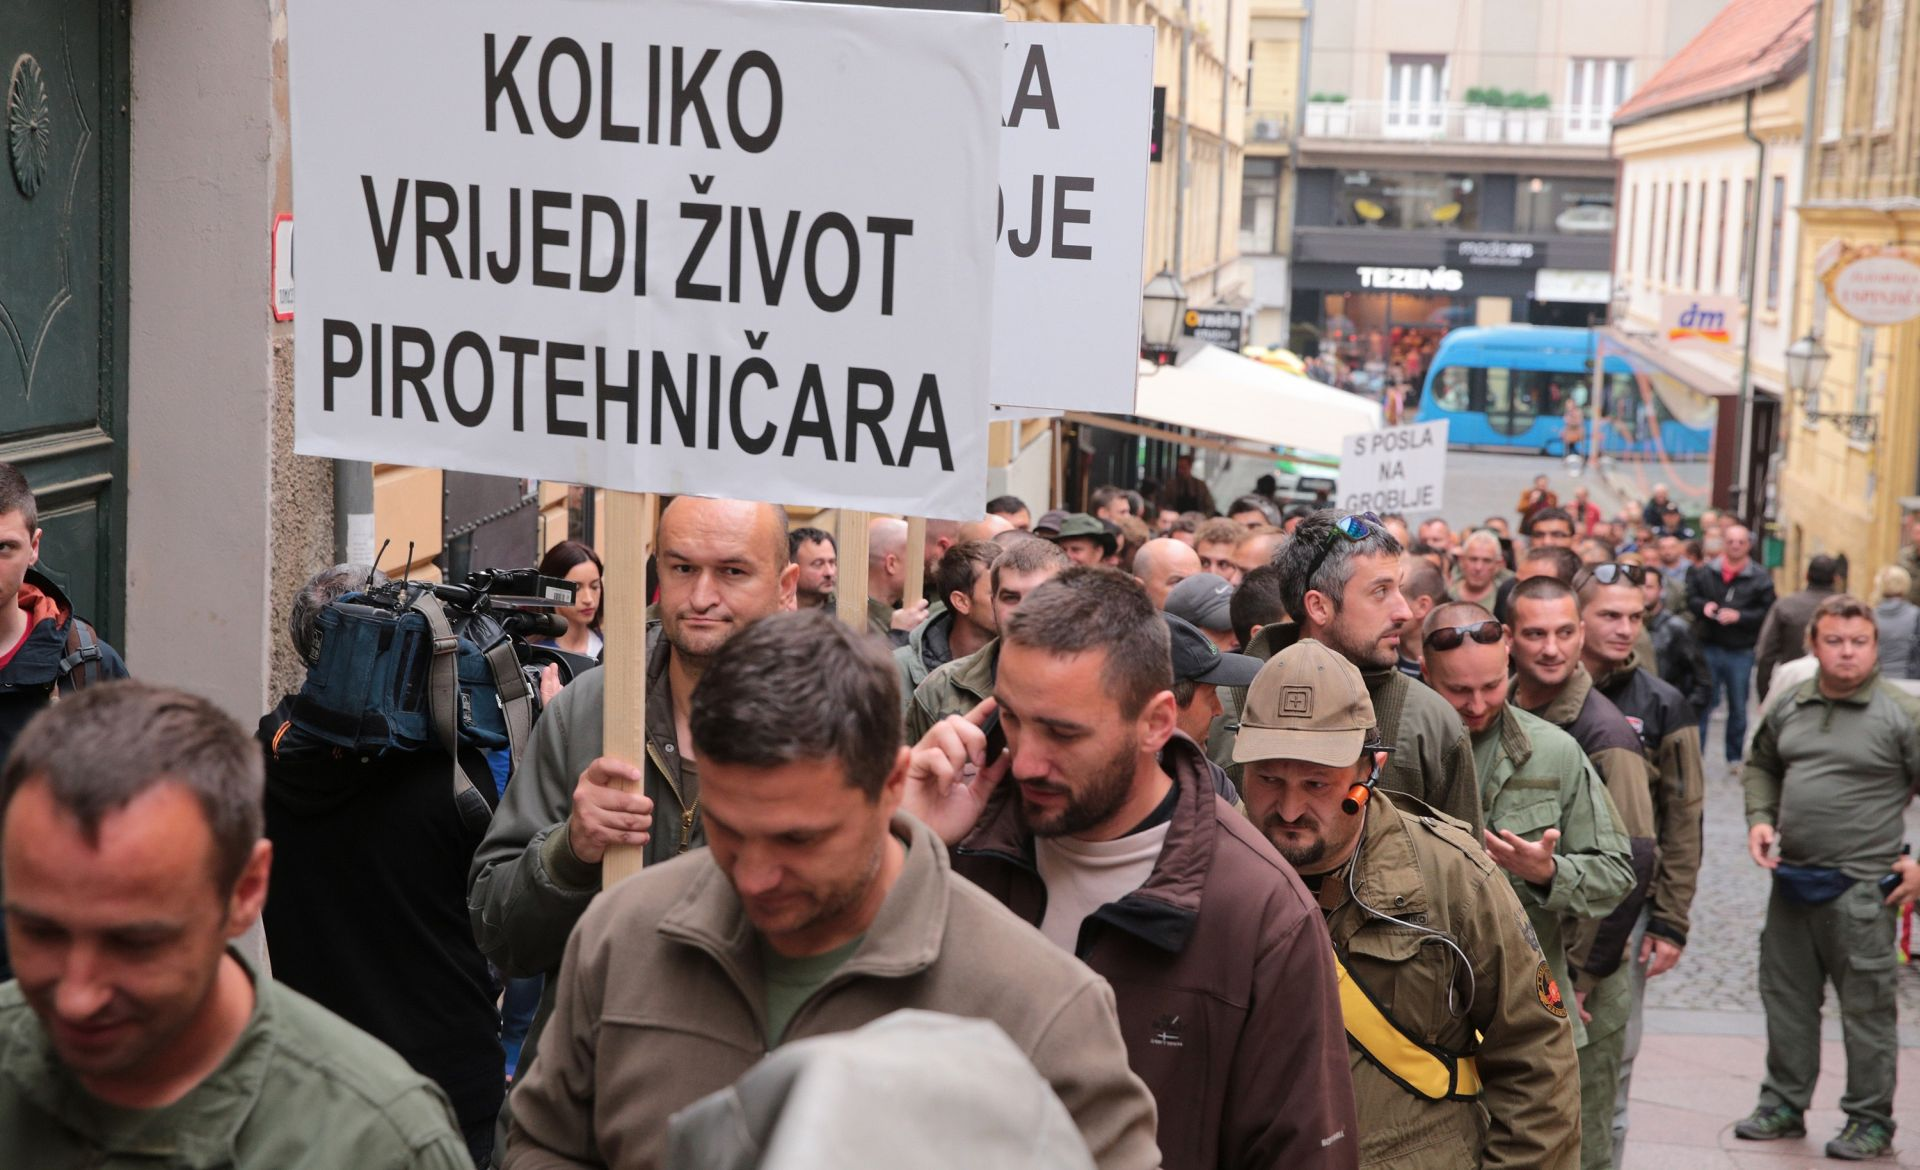 PROSVJEDNA POVORKA: Oko 300 pirotehničara krenulo prema Markovom trgu